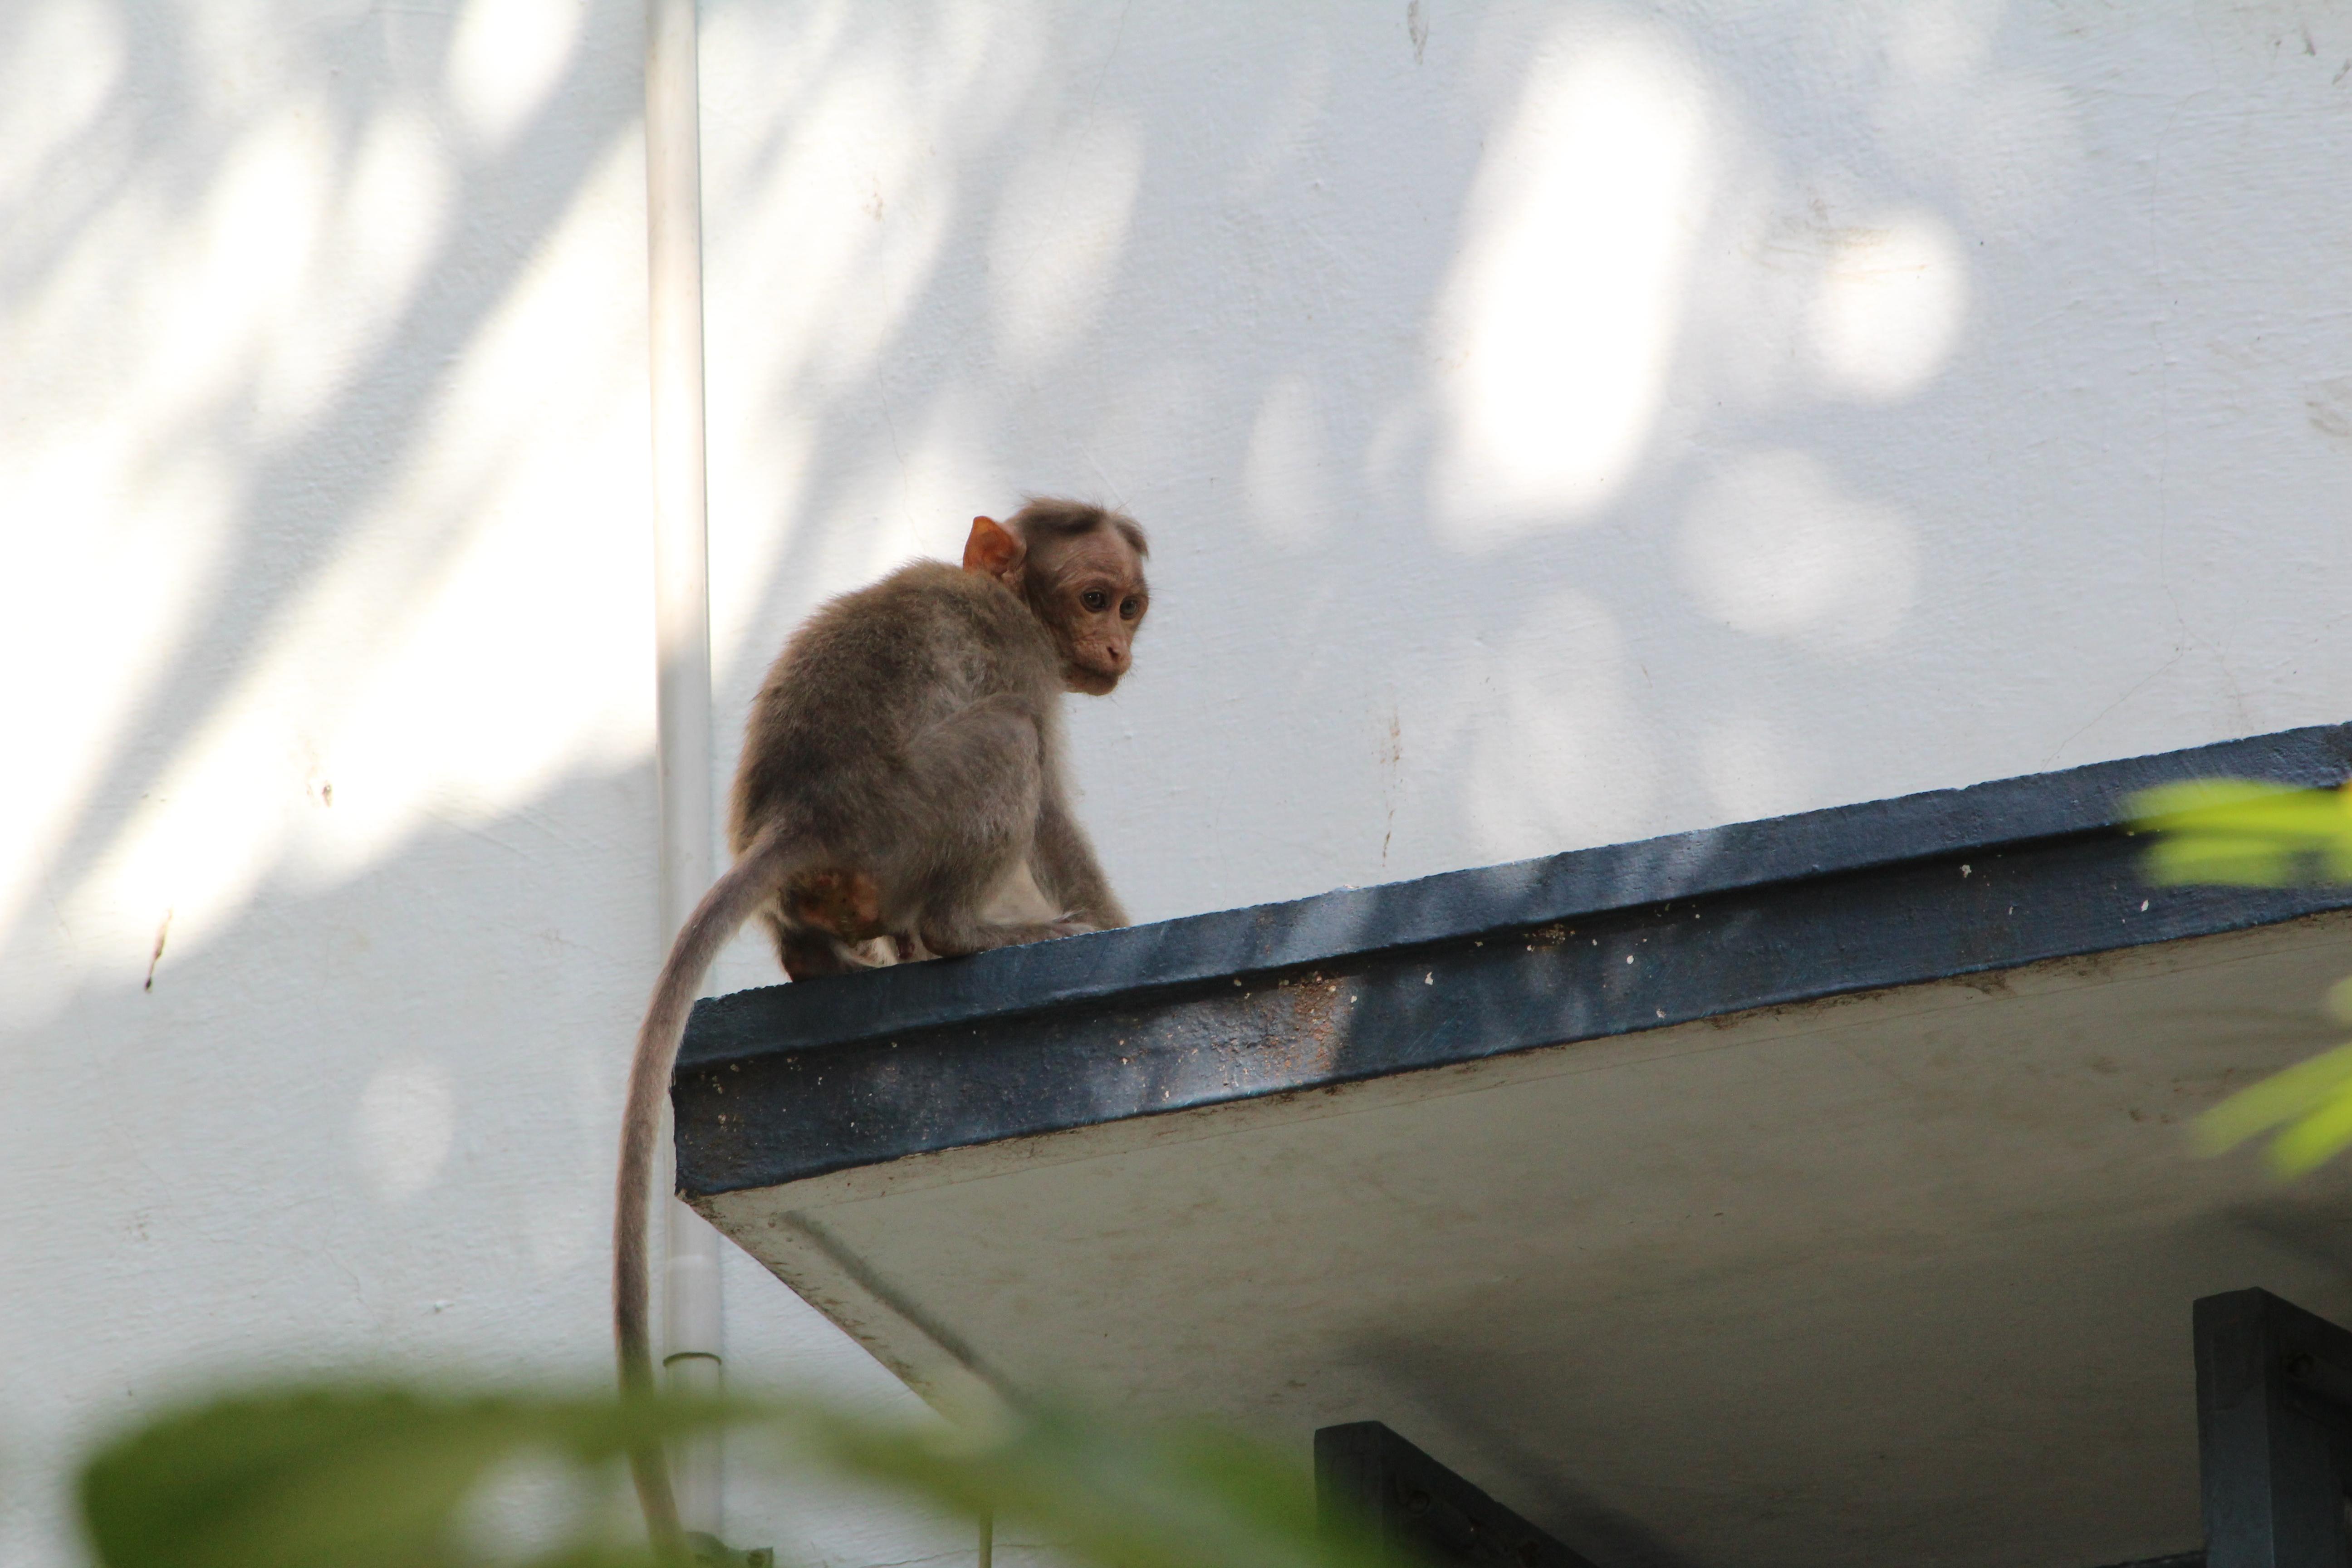 IIT Madras Wikipedia: File:Monkey In Iitm.jpg